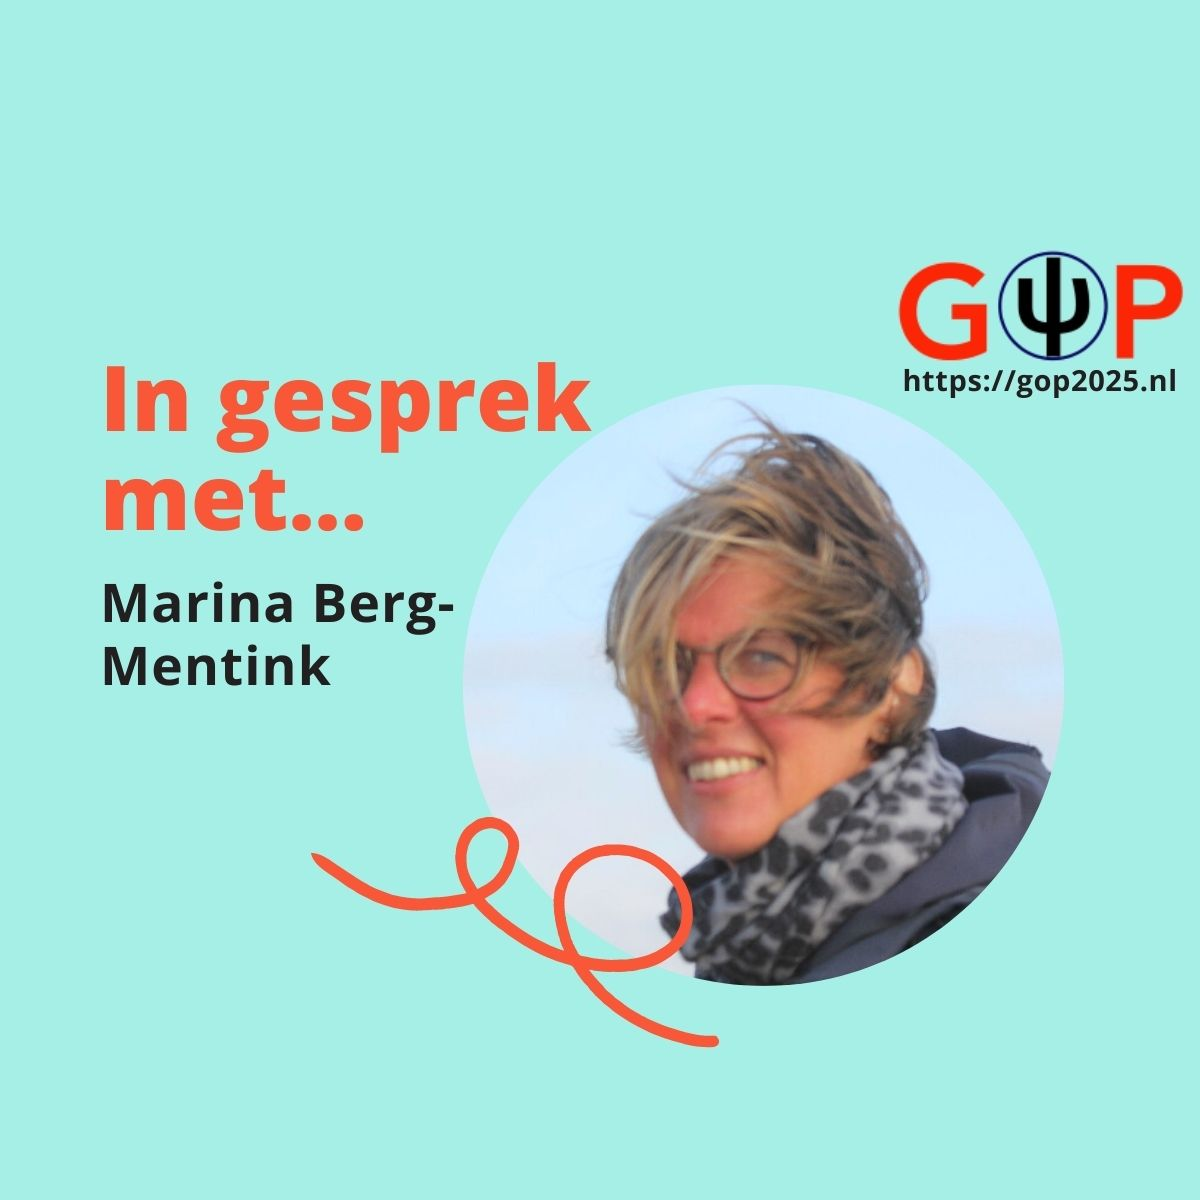 In gesprek met Marina Berg-Mentink